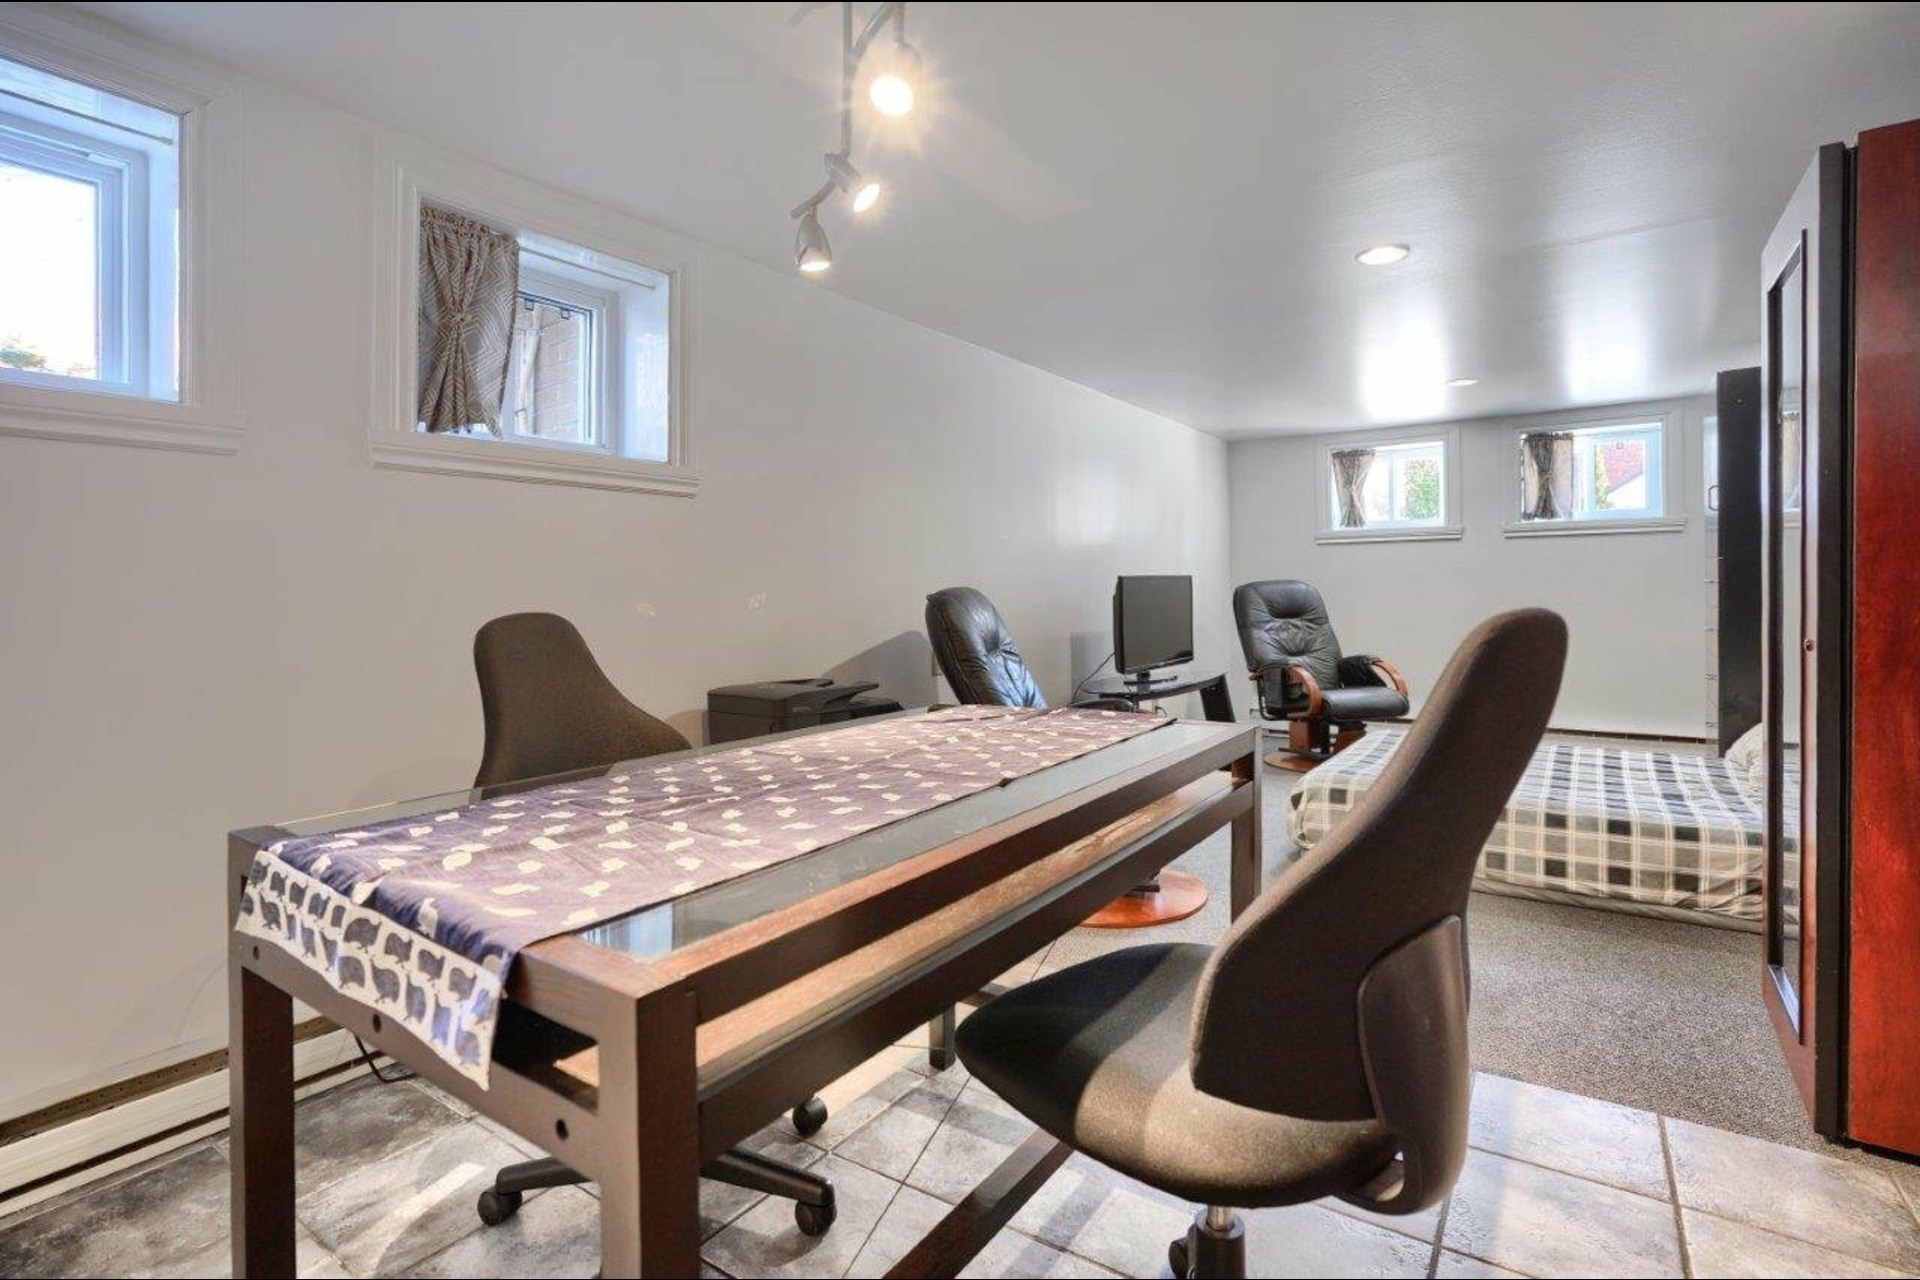 image 29 - Triplex For sale Saint-Lambert - 5 rooms